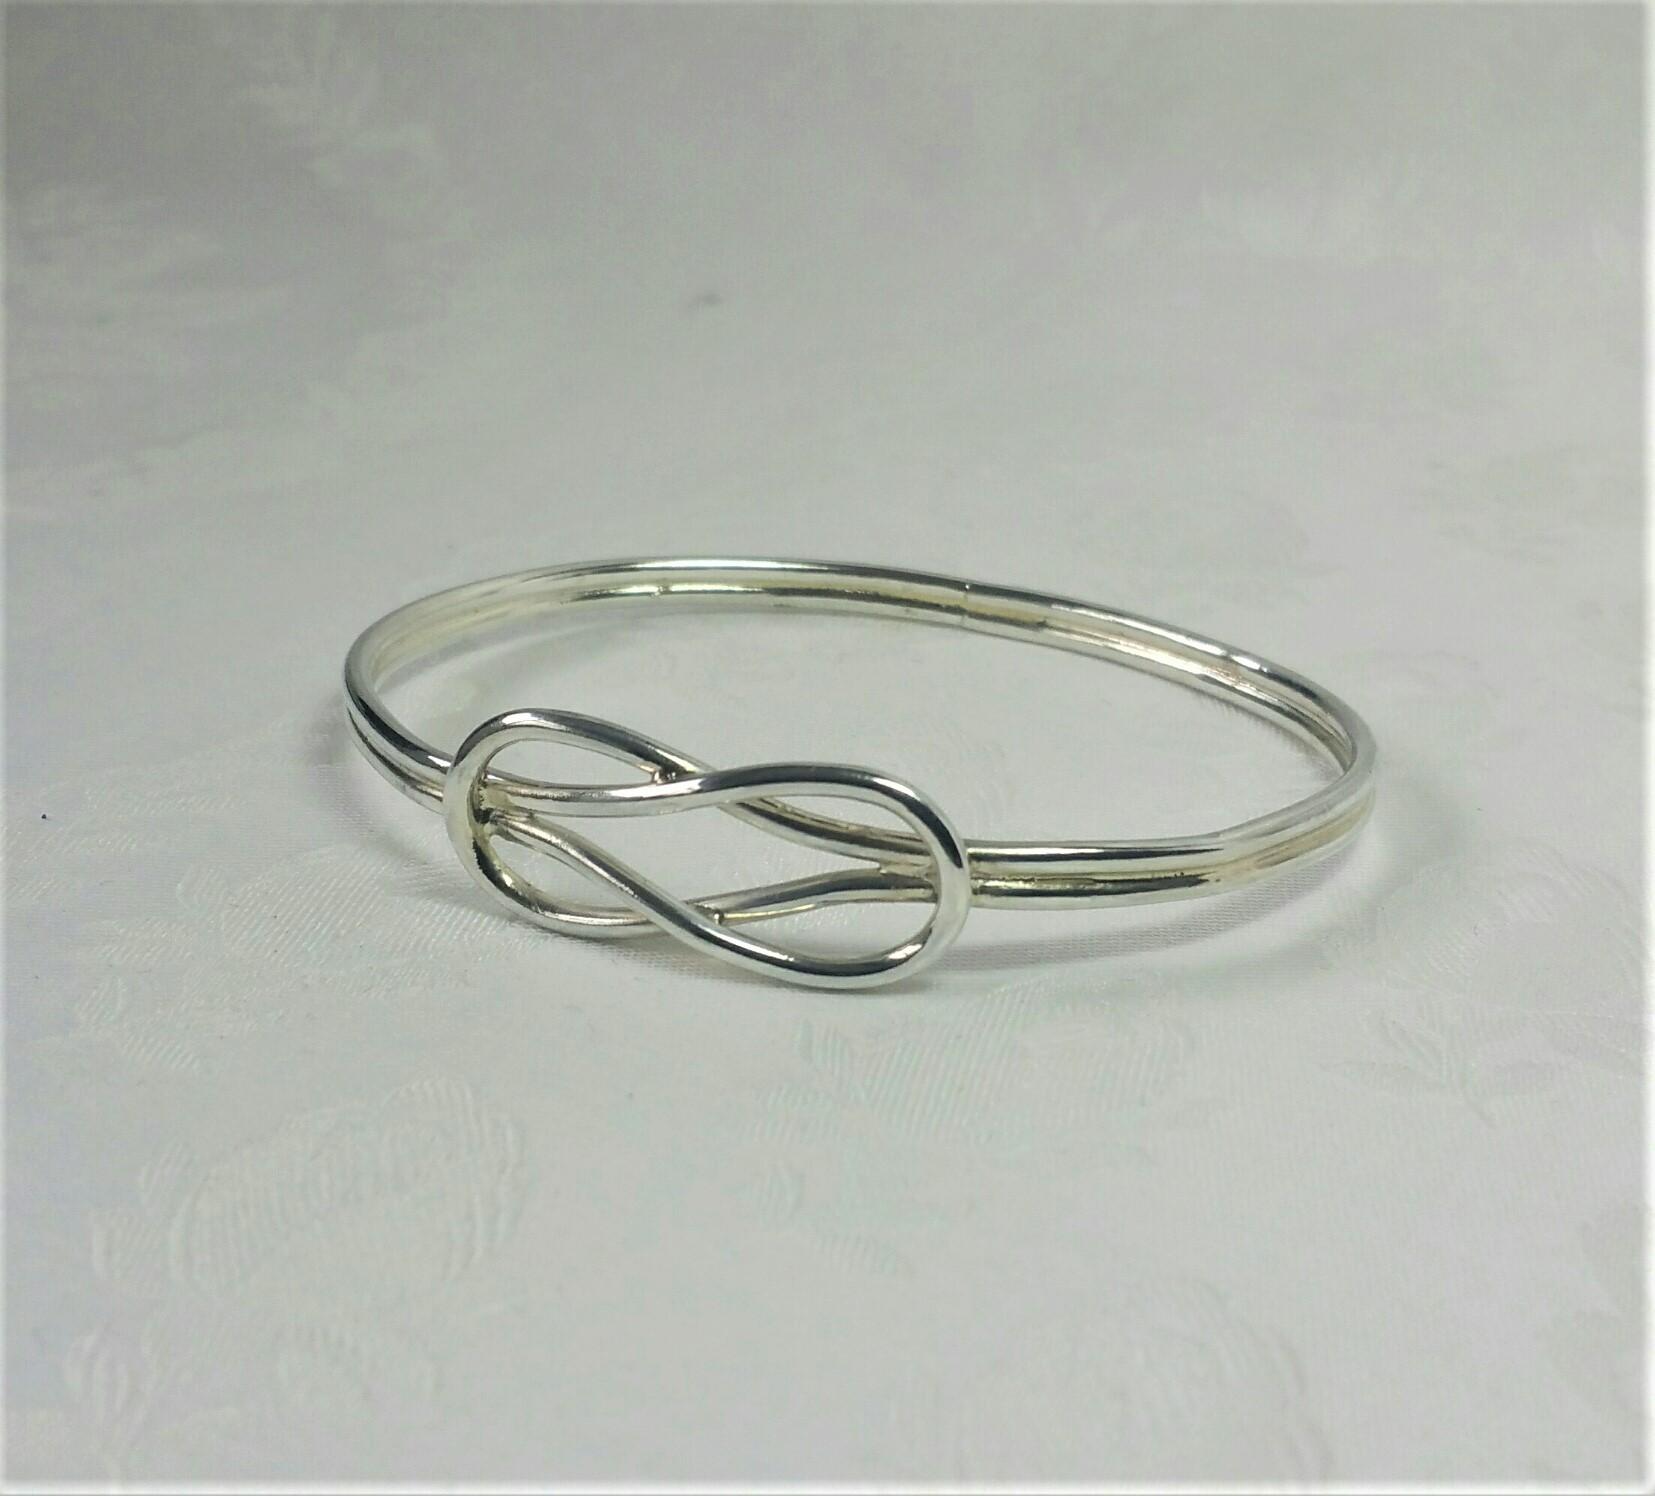 Roman Hercules Knot Bangle Gemmeus Handcrafted Designer Maker Jewellery